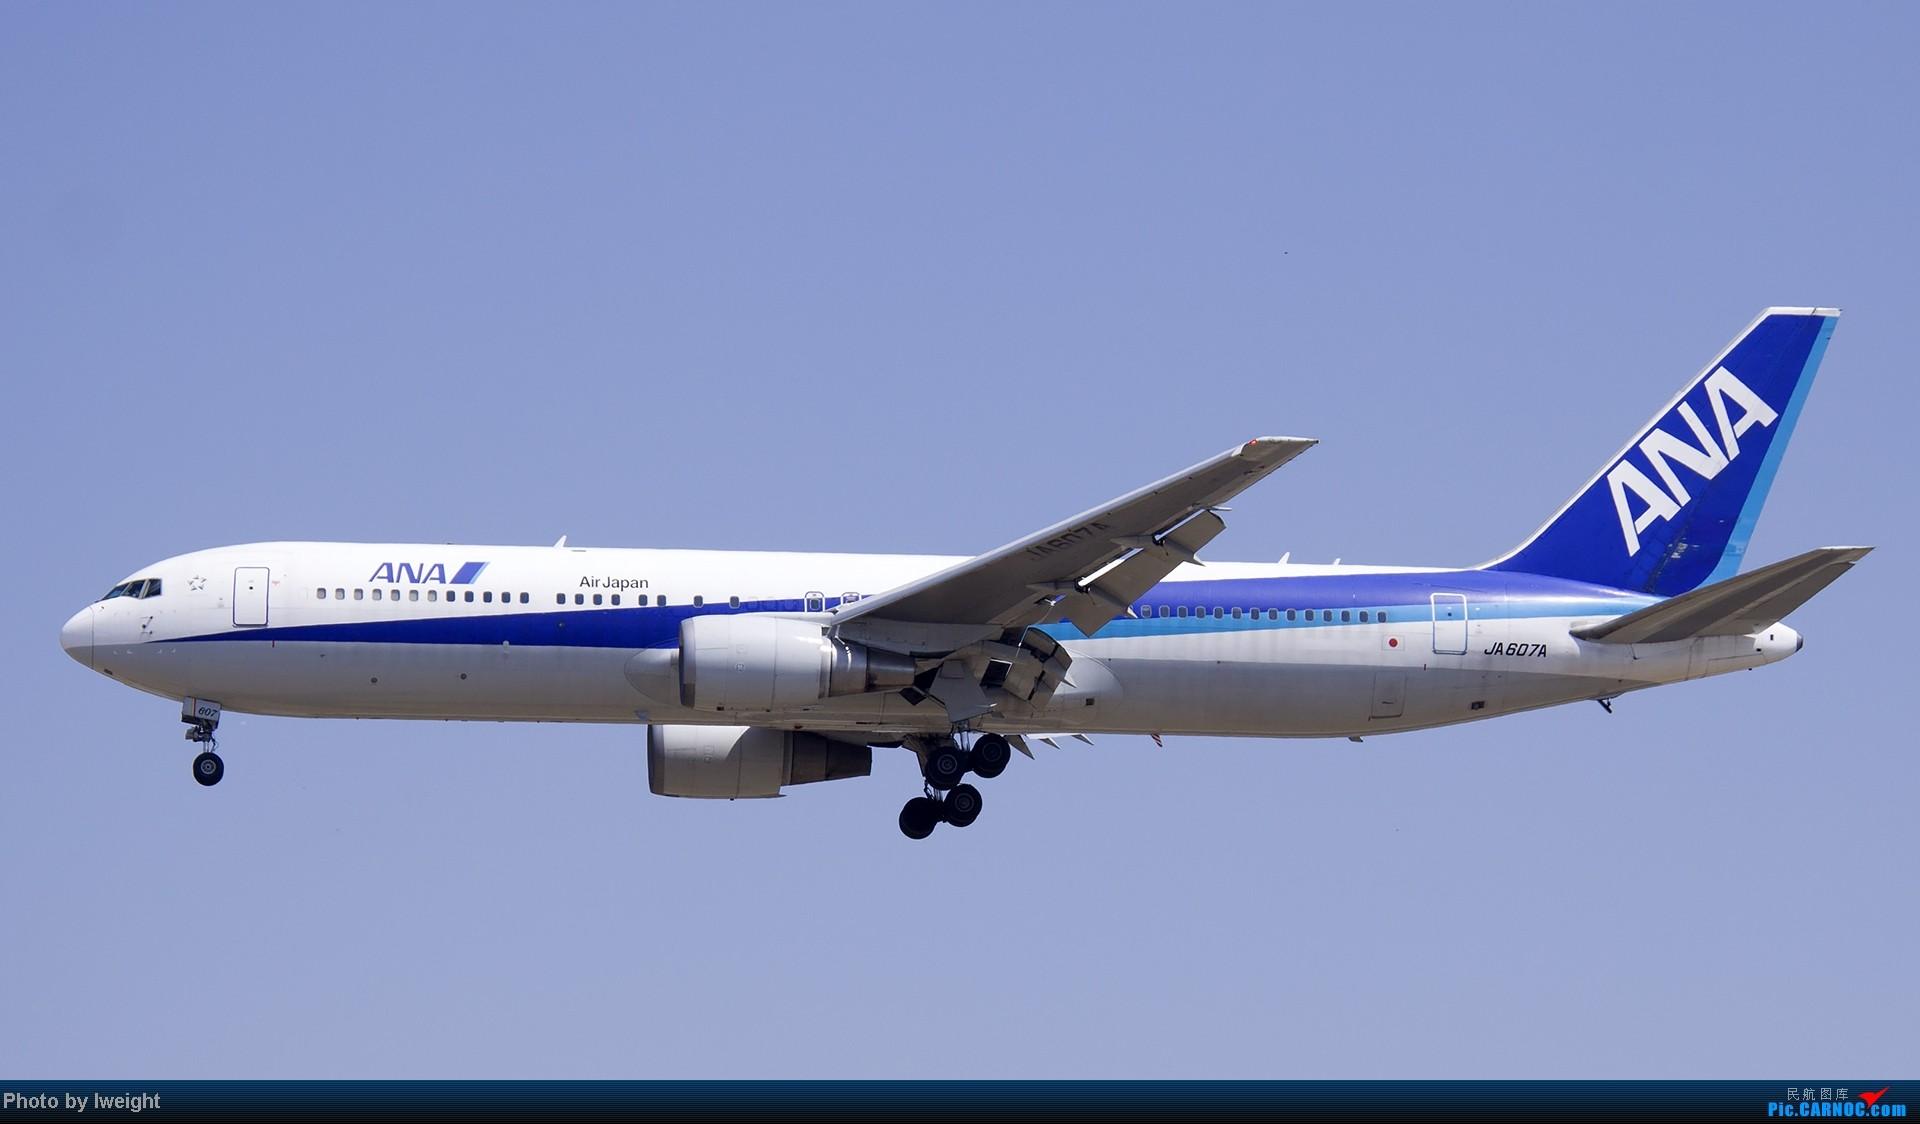 Re:[原创]北京难得的好天气,收获多种机型和彩绘,遗憾的是再次错过卡航巴塞罗那彩绘 BOEING 767-300 JA607A 中国北京首都机场